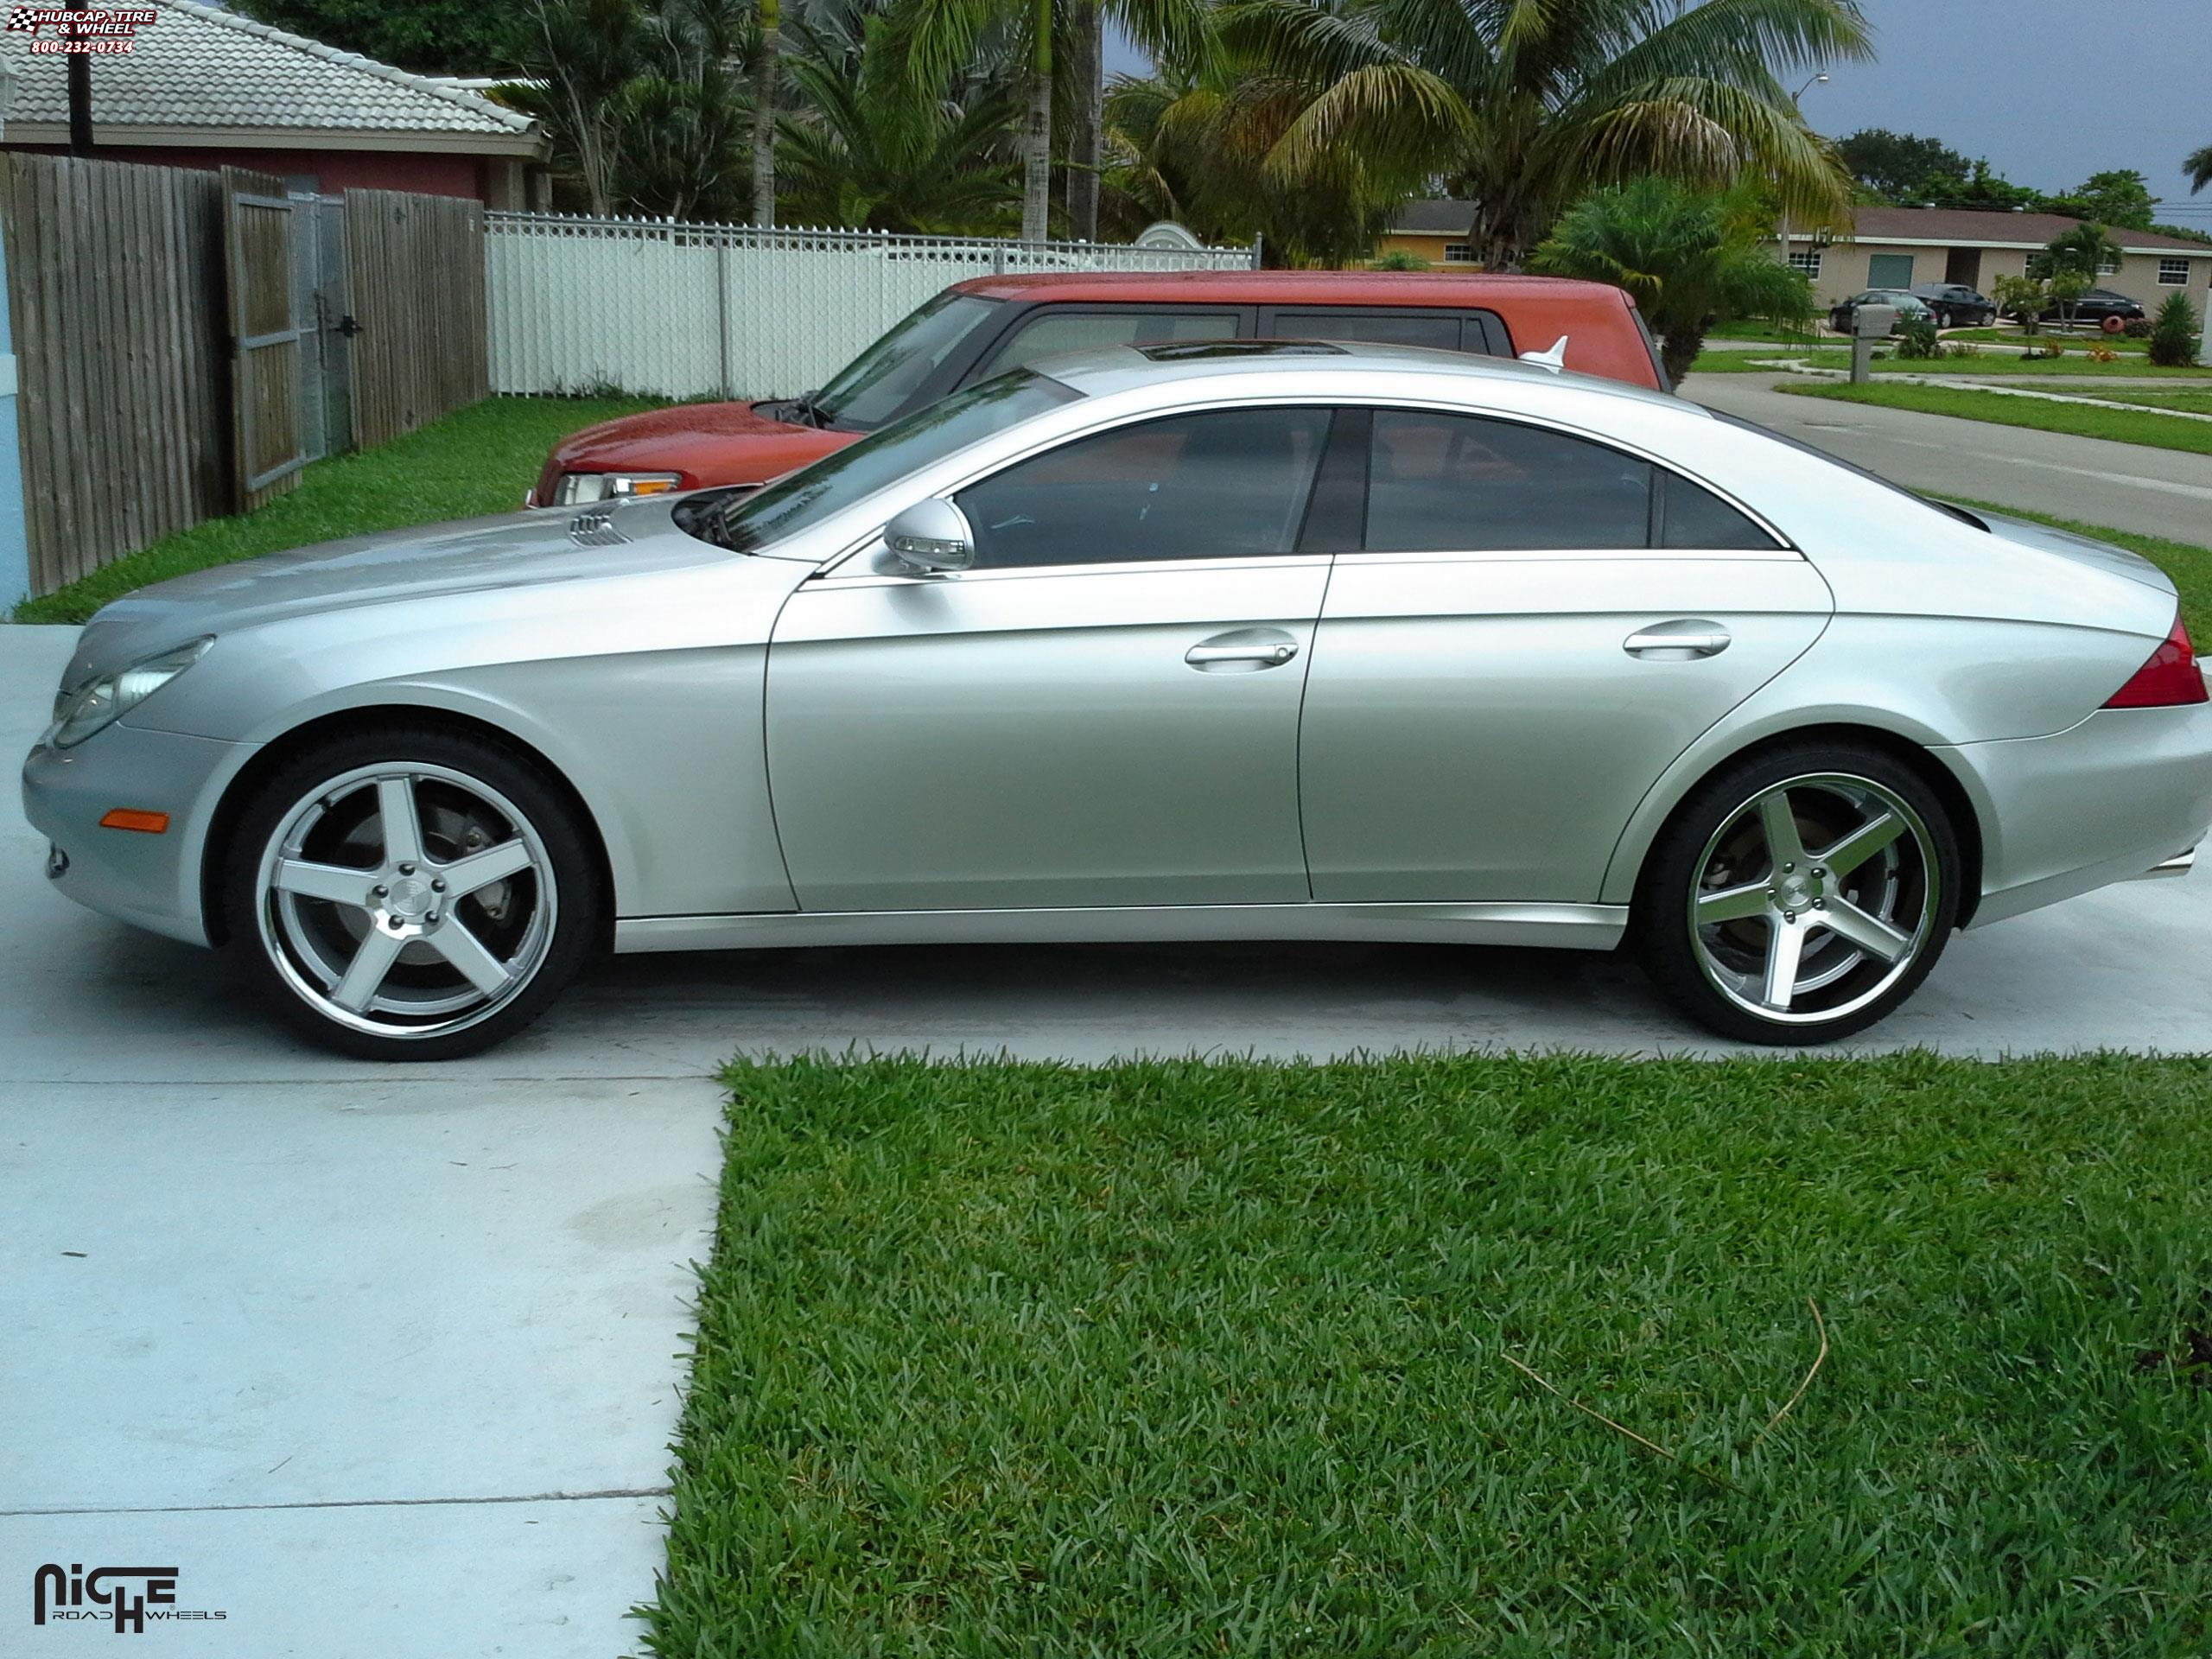 Mercedes benz cls niche nurburg m881 wheels silver for Mercedes benz chrome